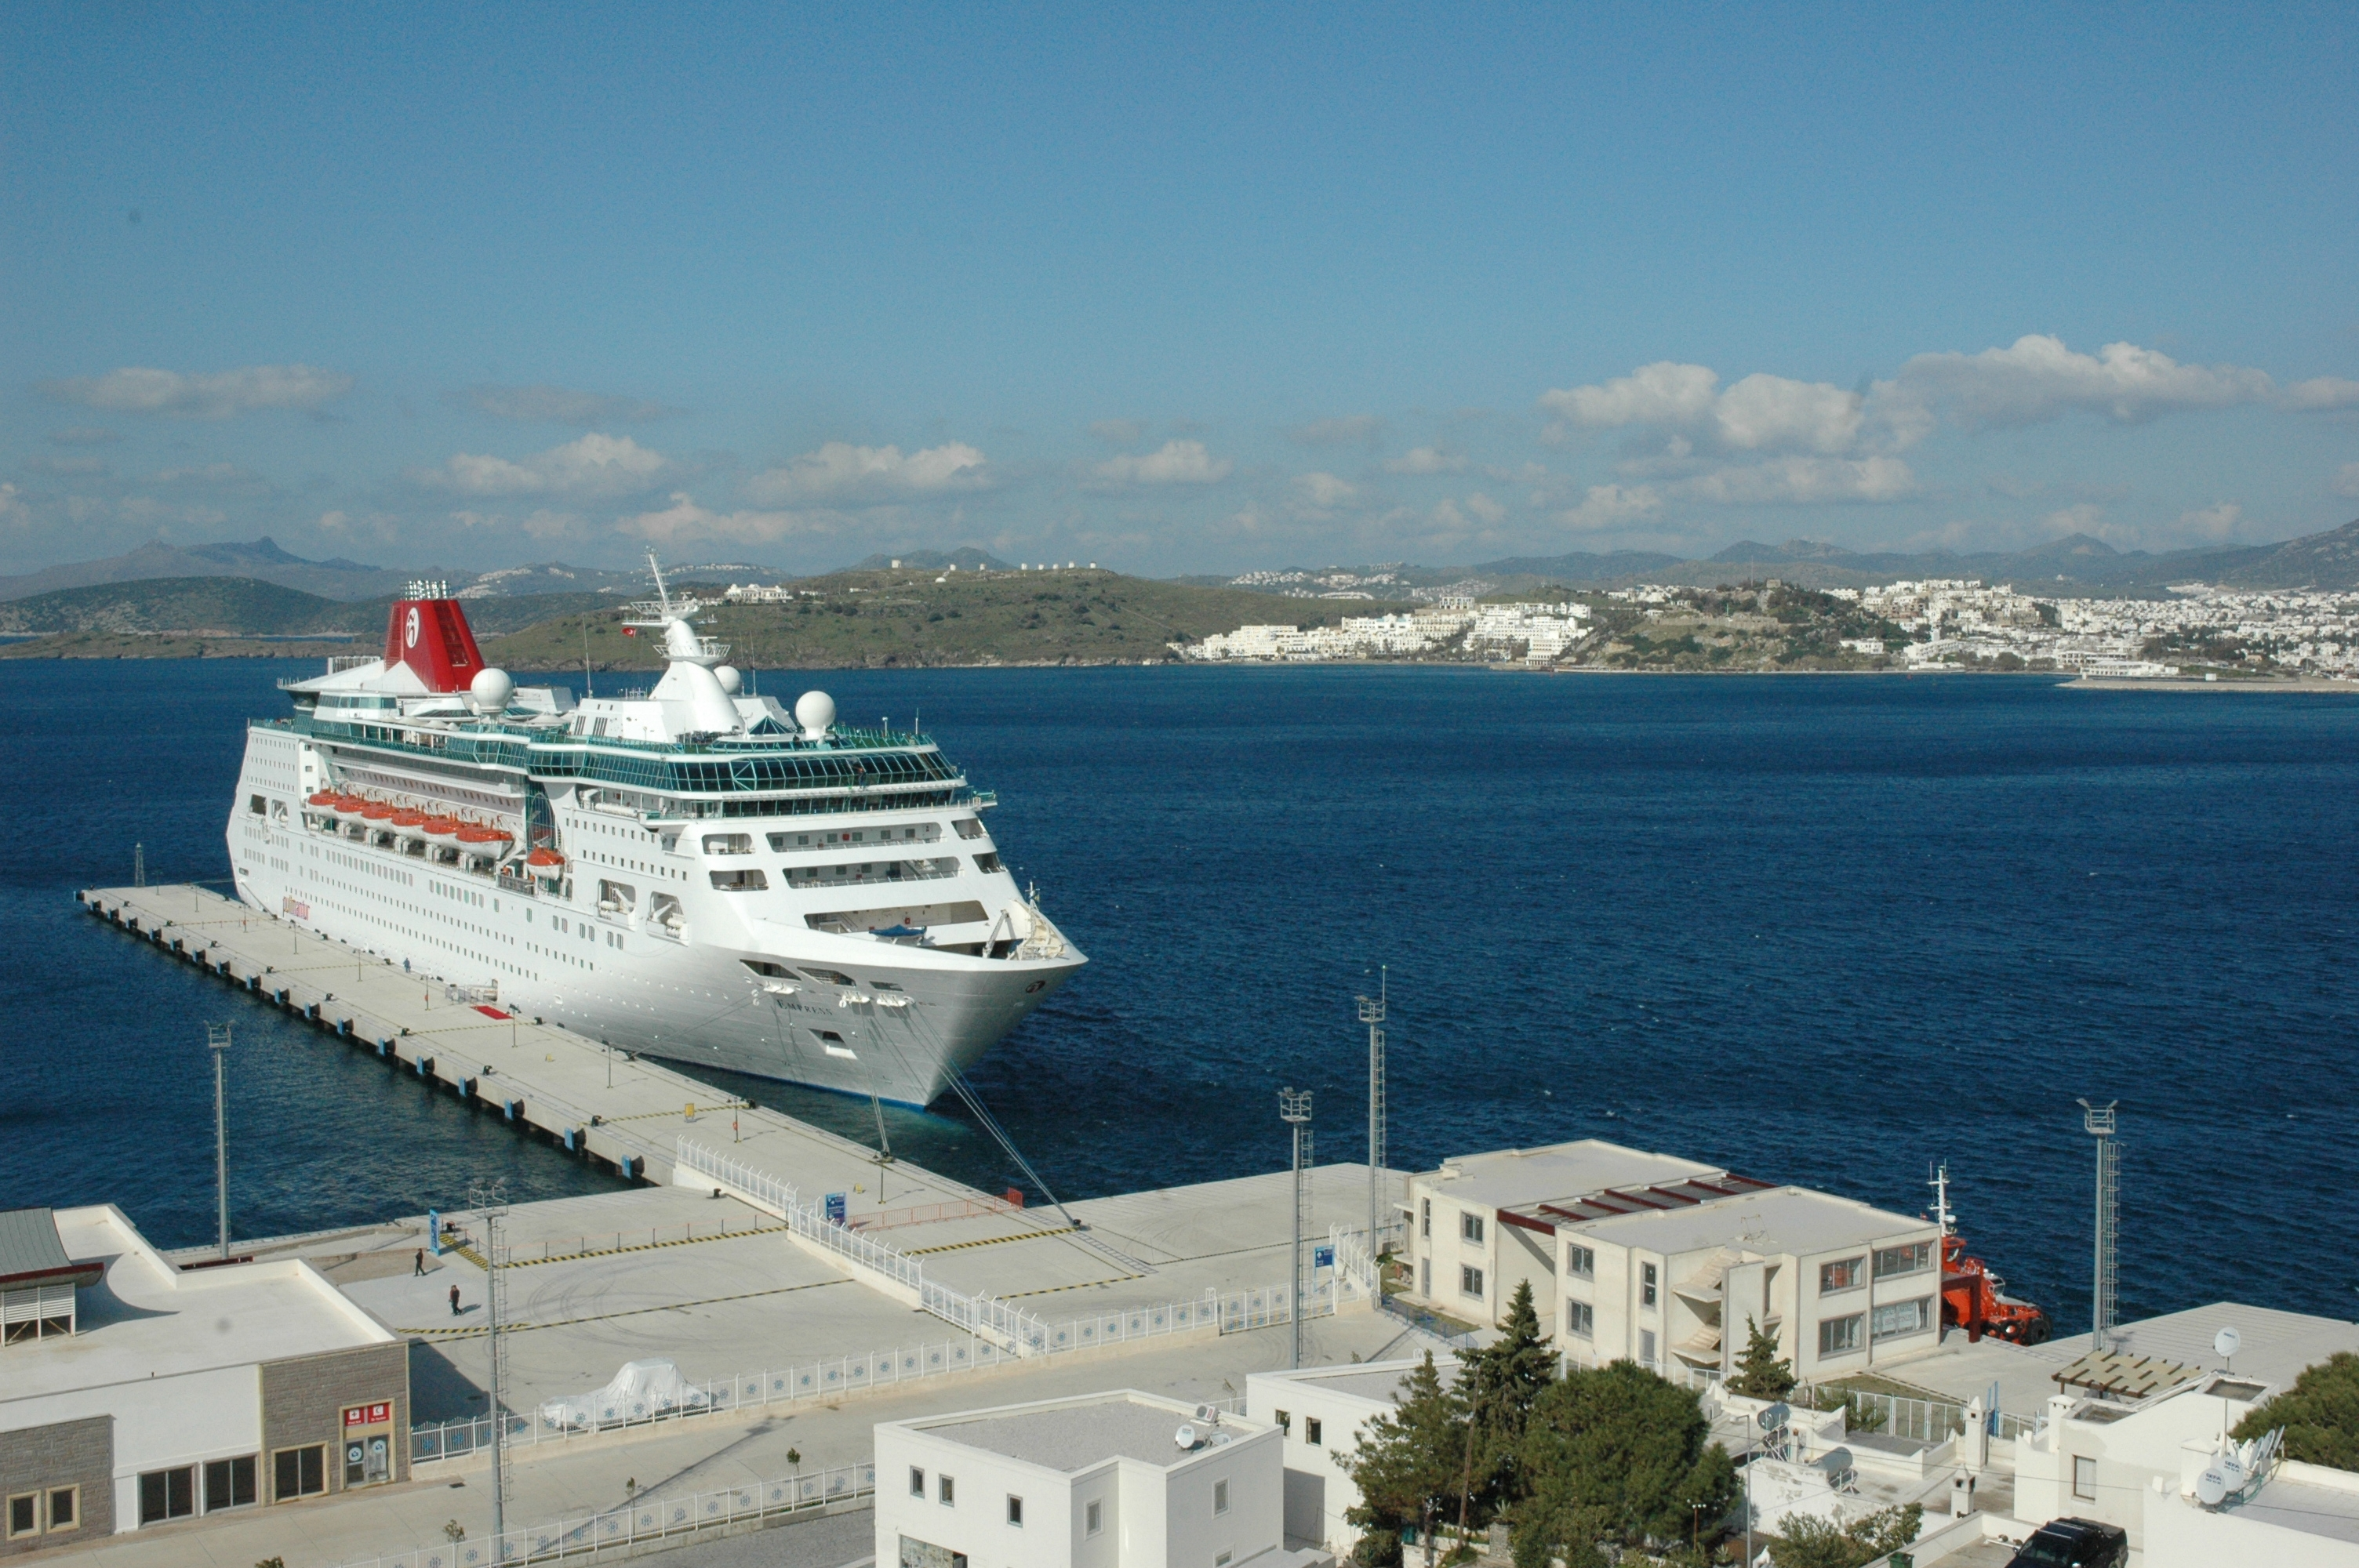 Istanbul cruise ship port transfer kusadasi cruise ship port transfer izmir cruise ship port - Ephesus turkey cruise port ...